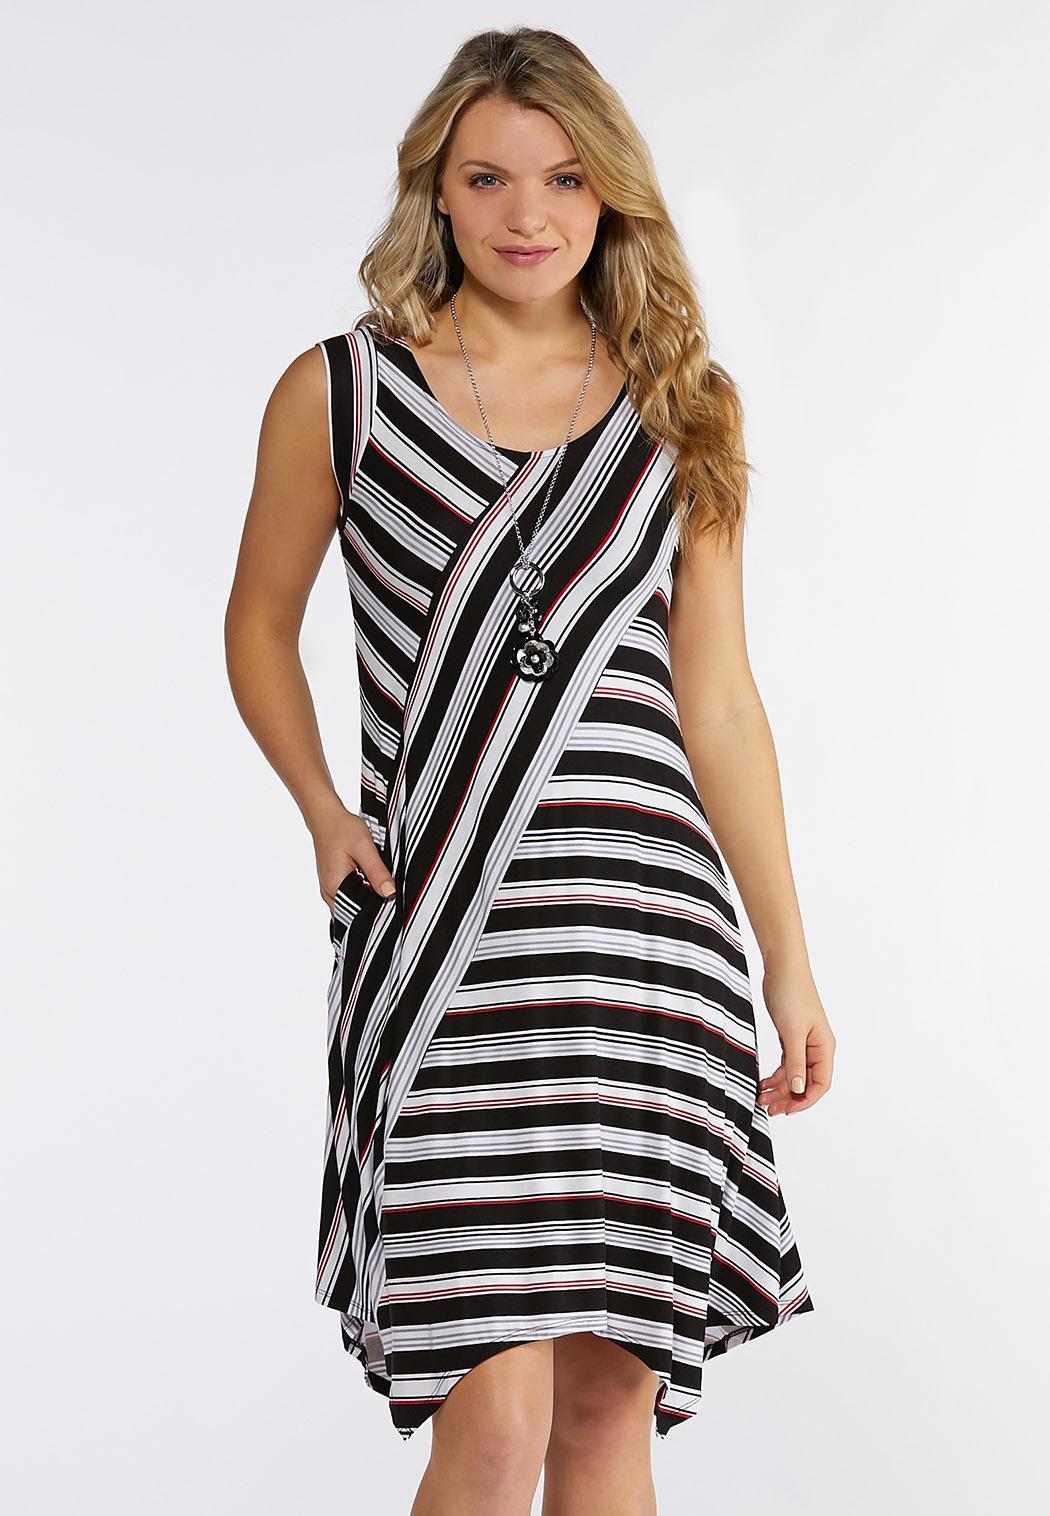 d982f9a1724 Multi Directional Stripe Dress alternate view Multi Directional Stripe Dress